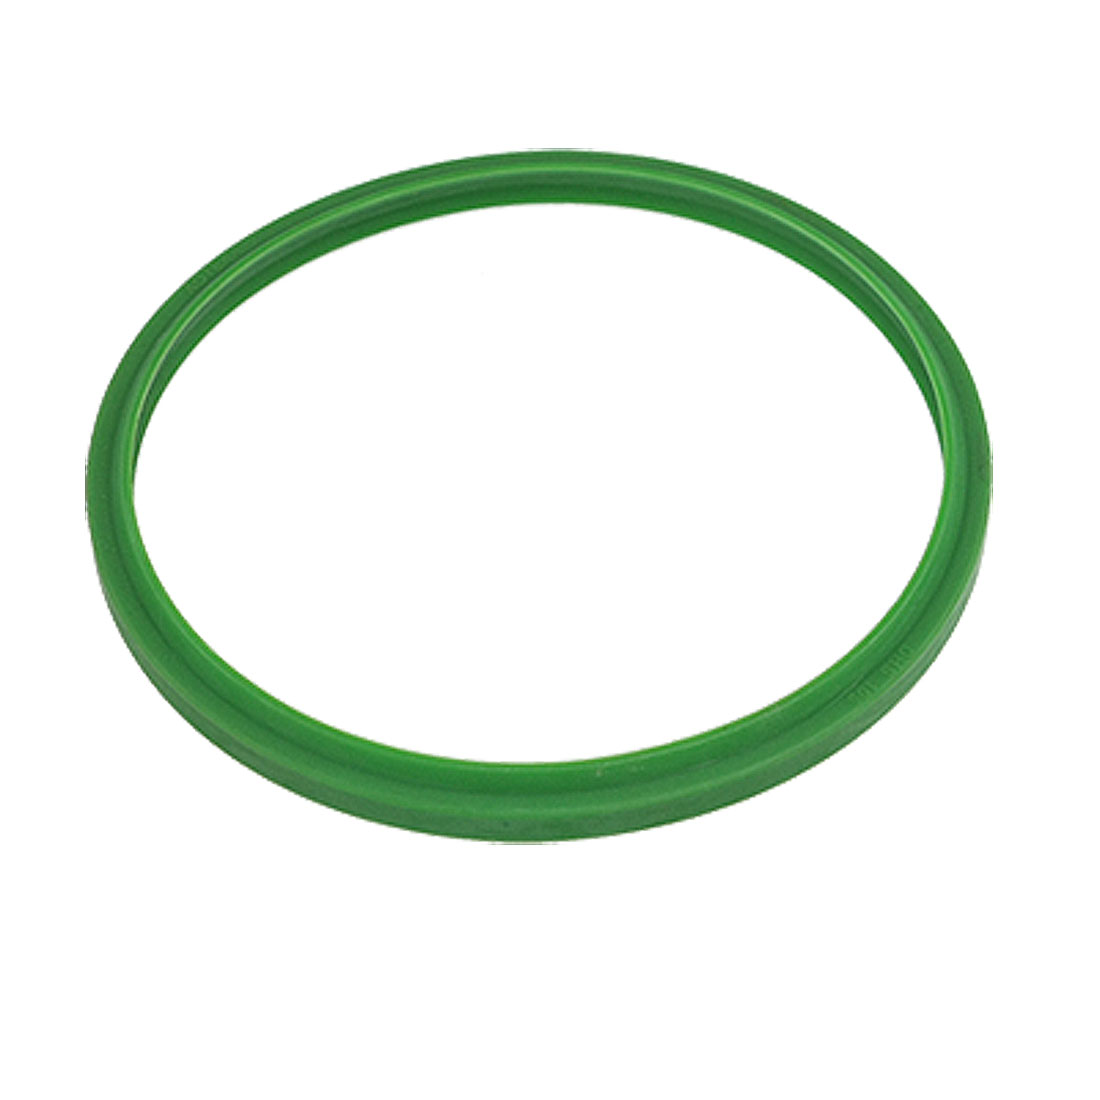 Green PU 105mm x 118mm Double Lip Sealing Cushion Dust Seal